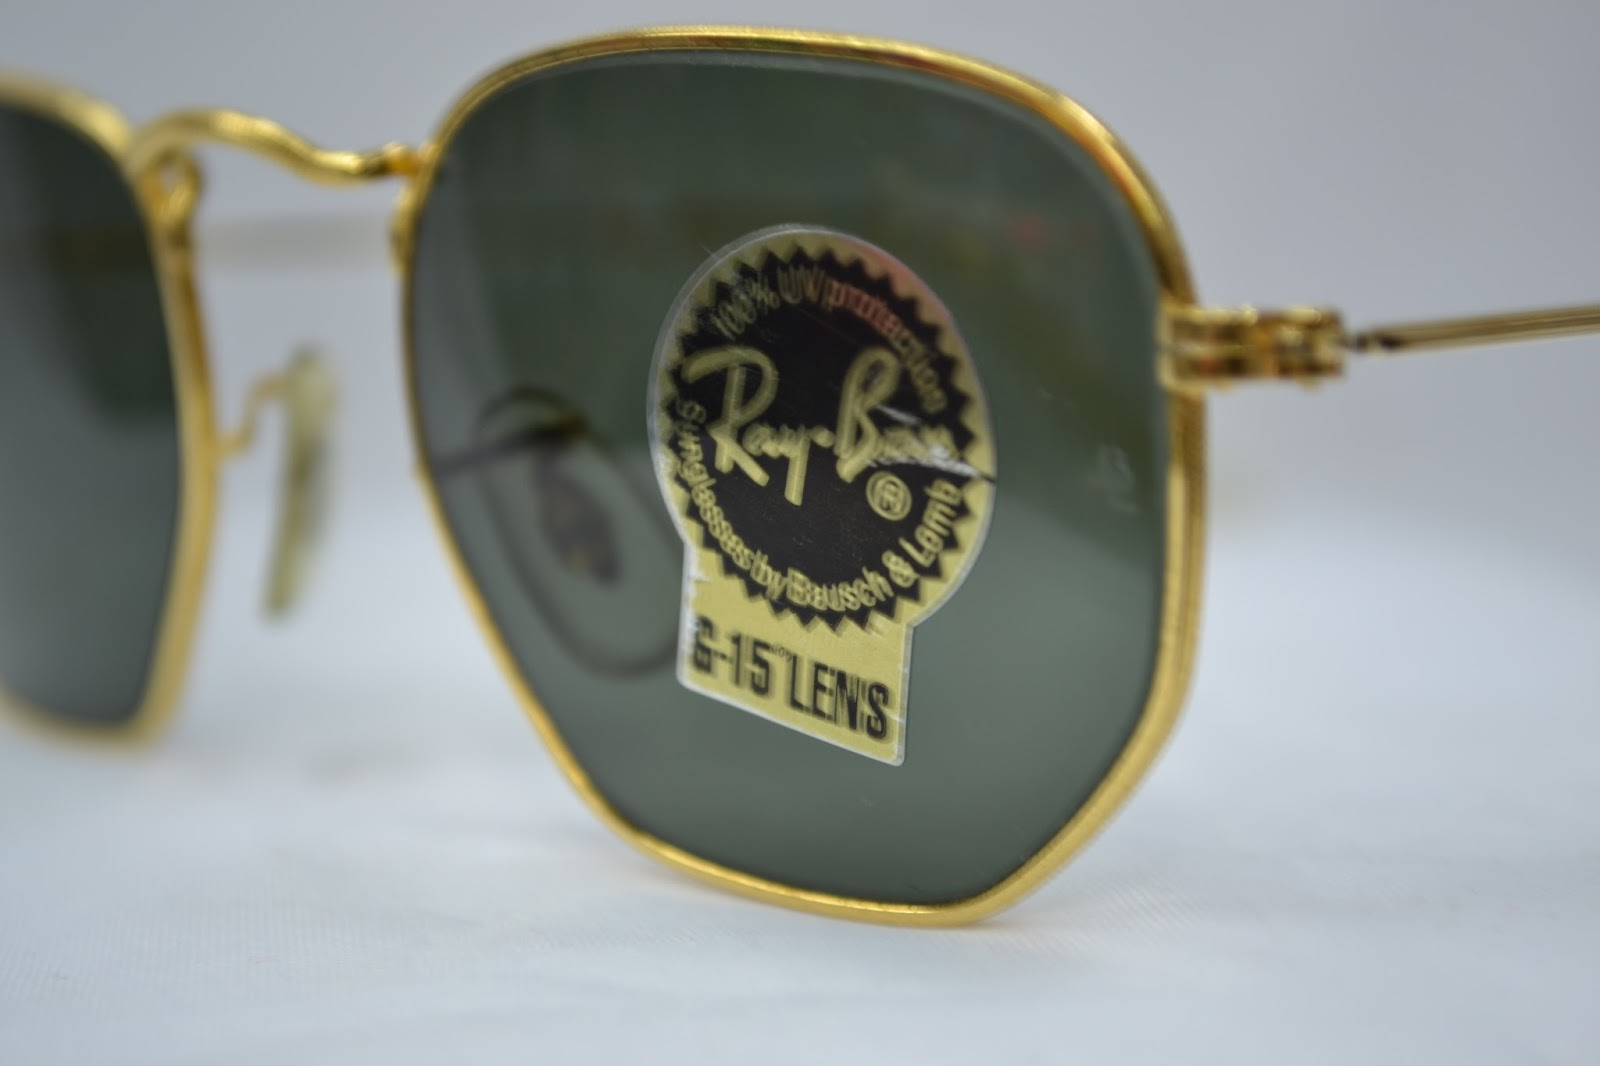 ray ban g15 lens aviator